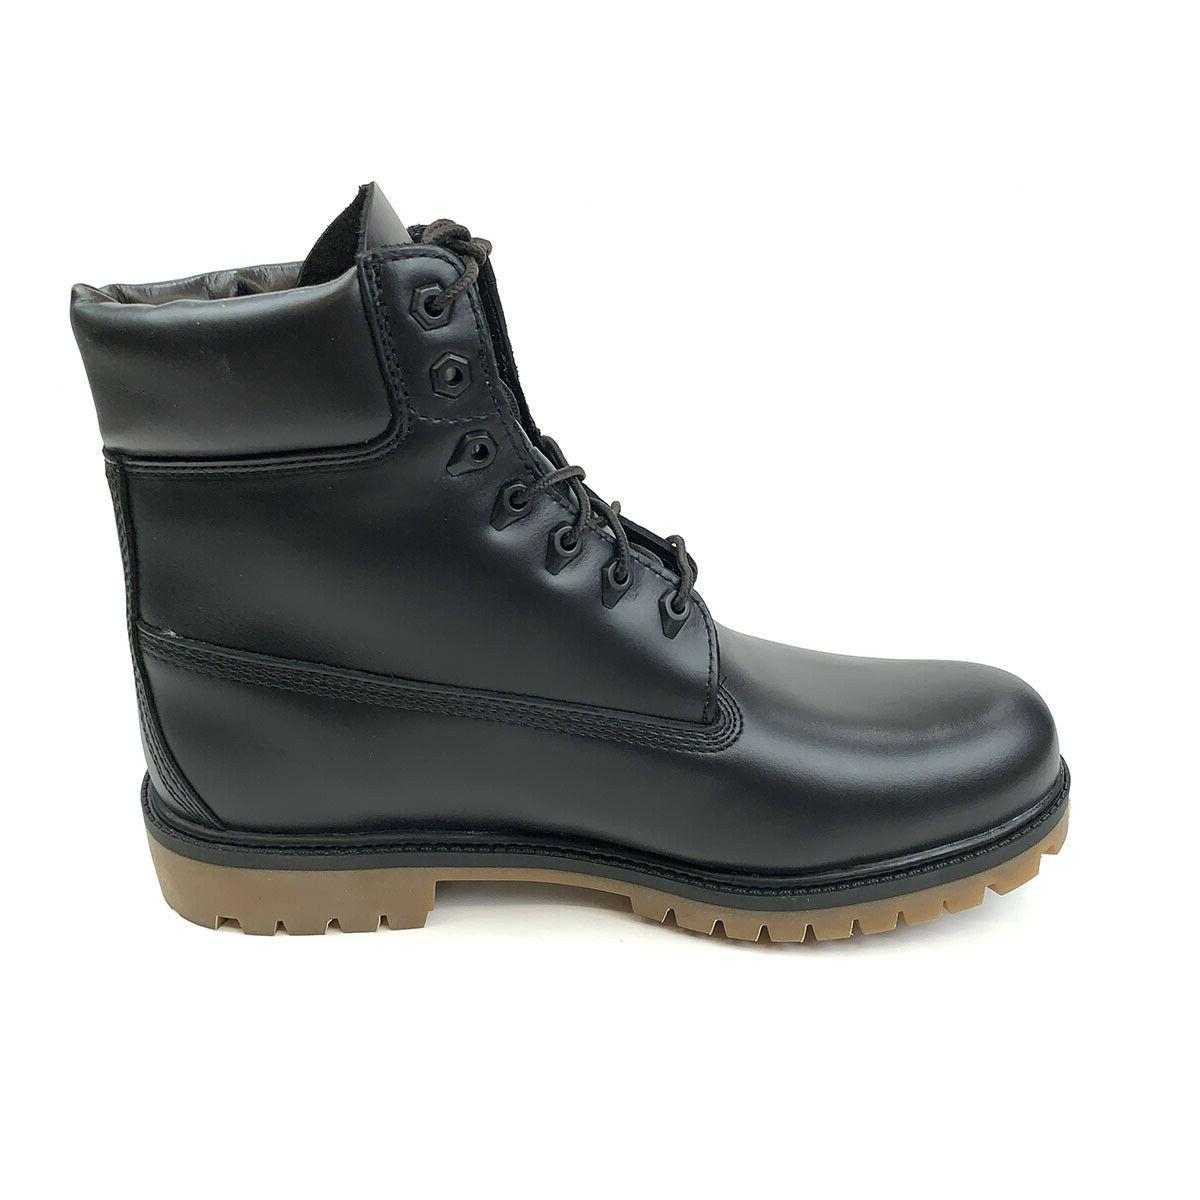 "Timberland 6"" Waterproof Grain Boots A22WK"